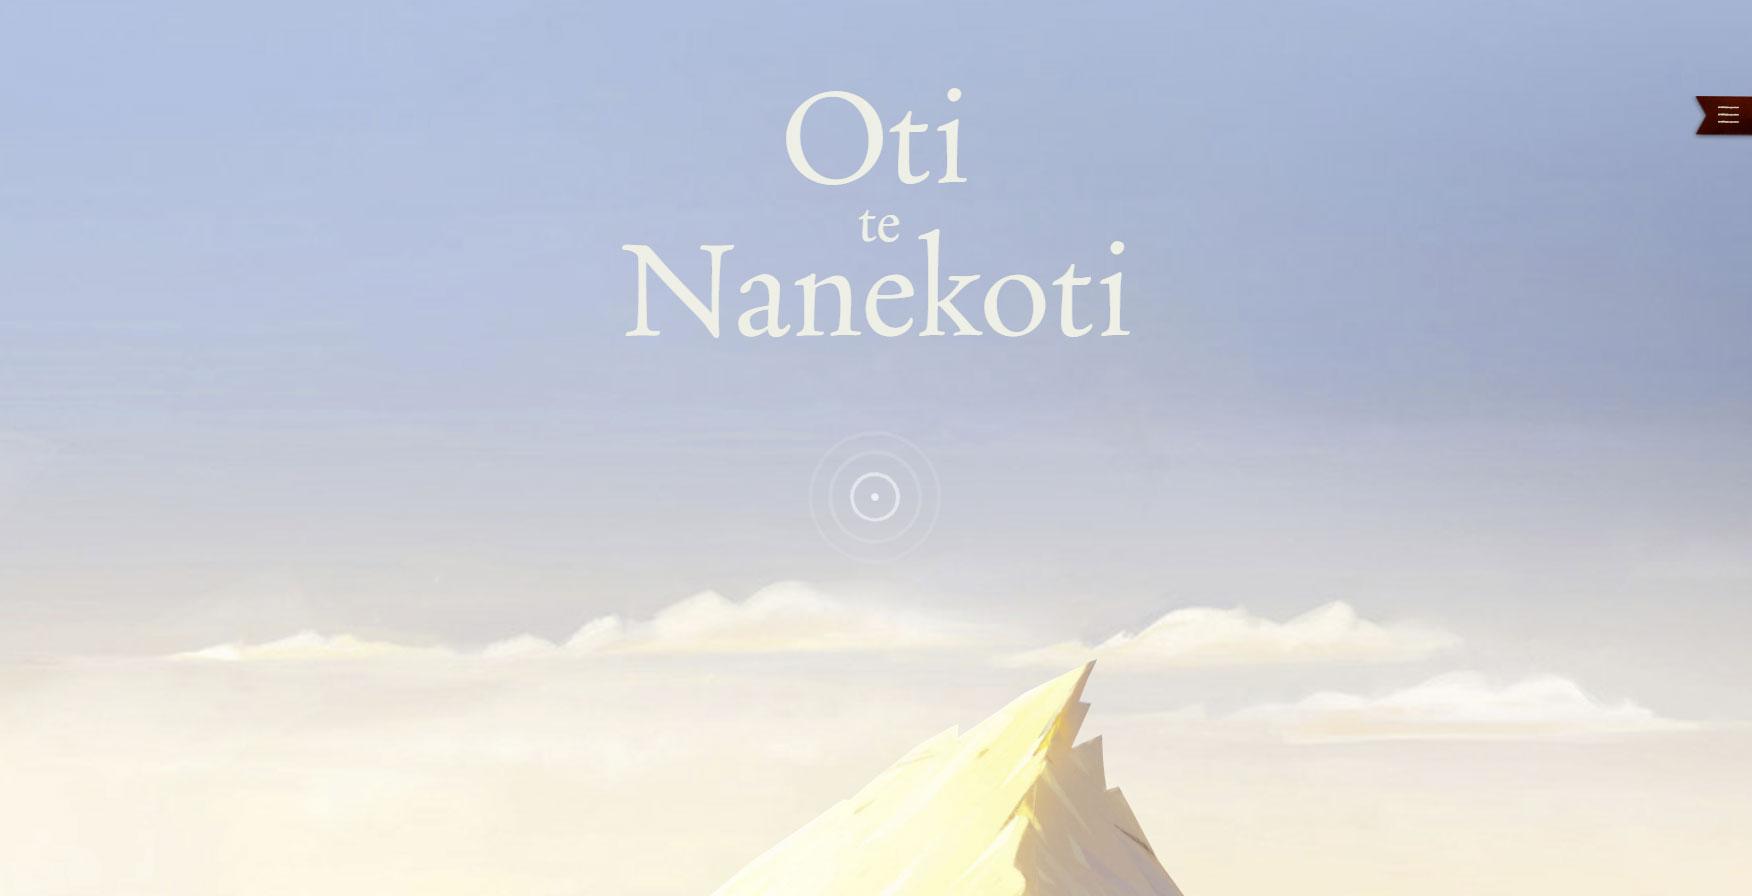 Title screen for Oti te Nanekoti, the Māori version